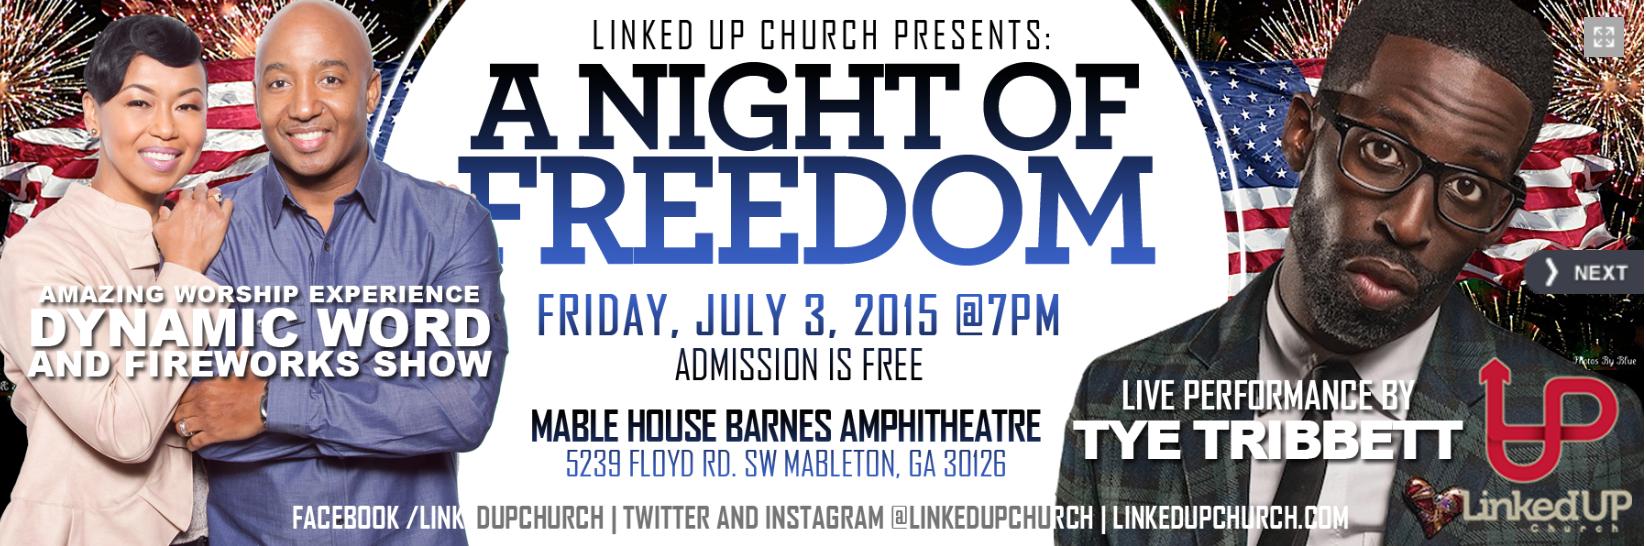 4th of July Events in the Atlanta Area! – atlantago2rose